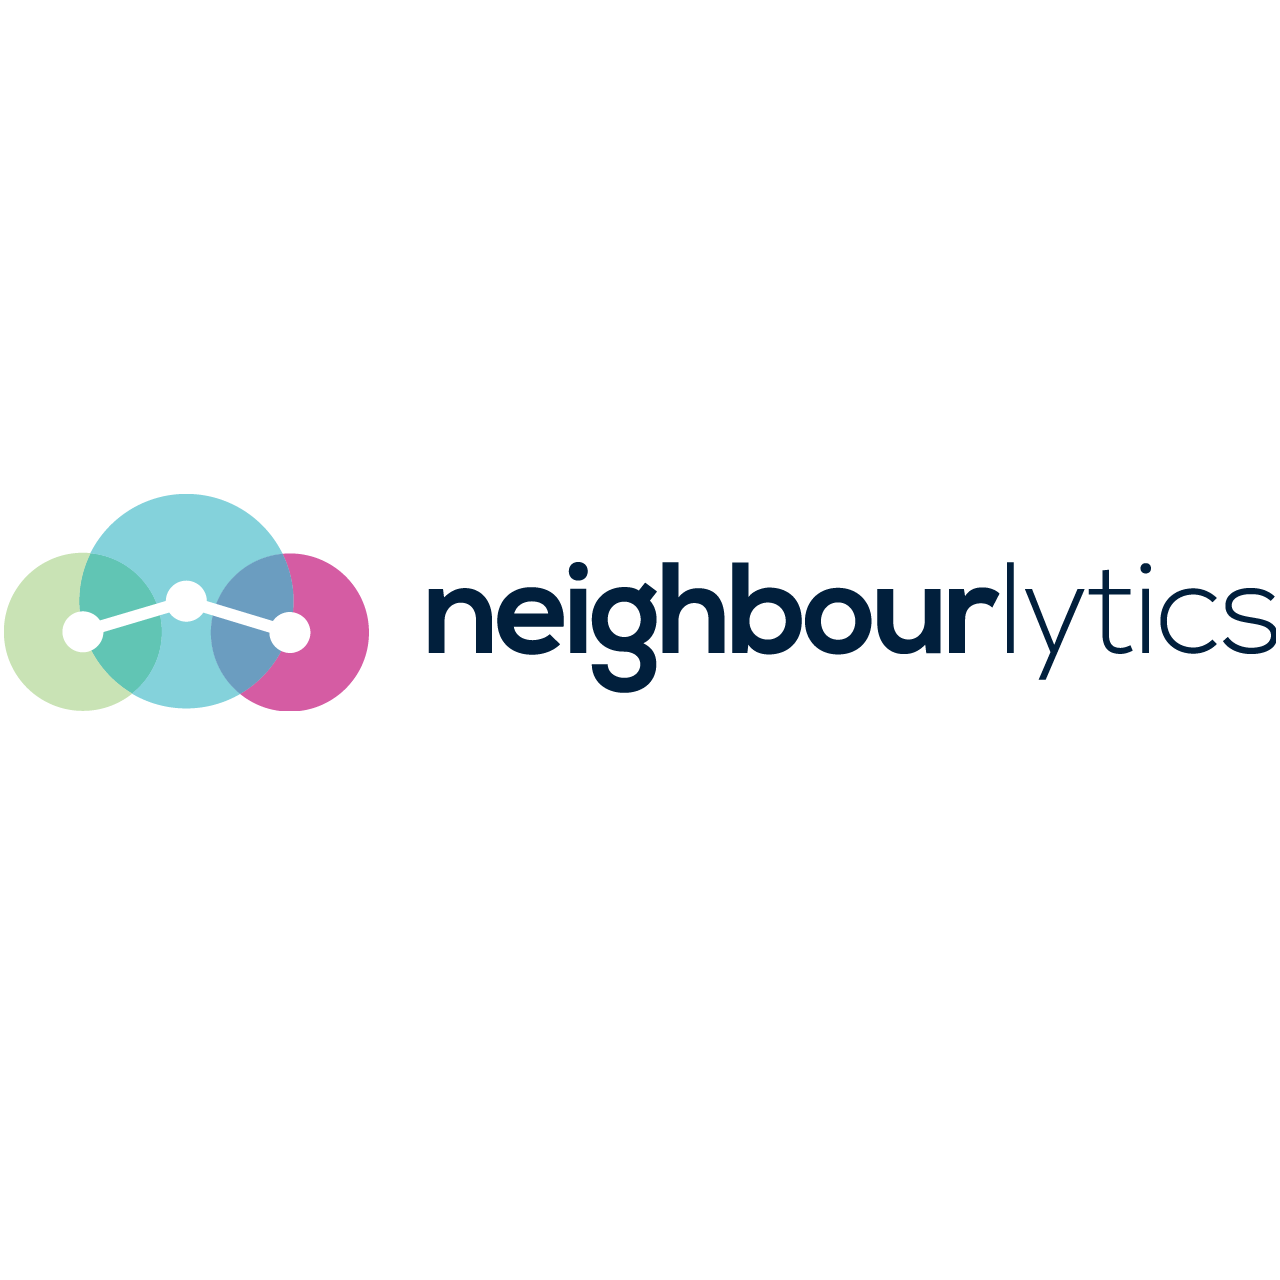 neighbourlytics-square.png